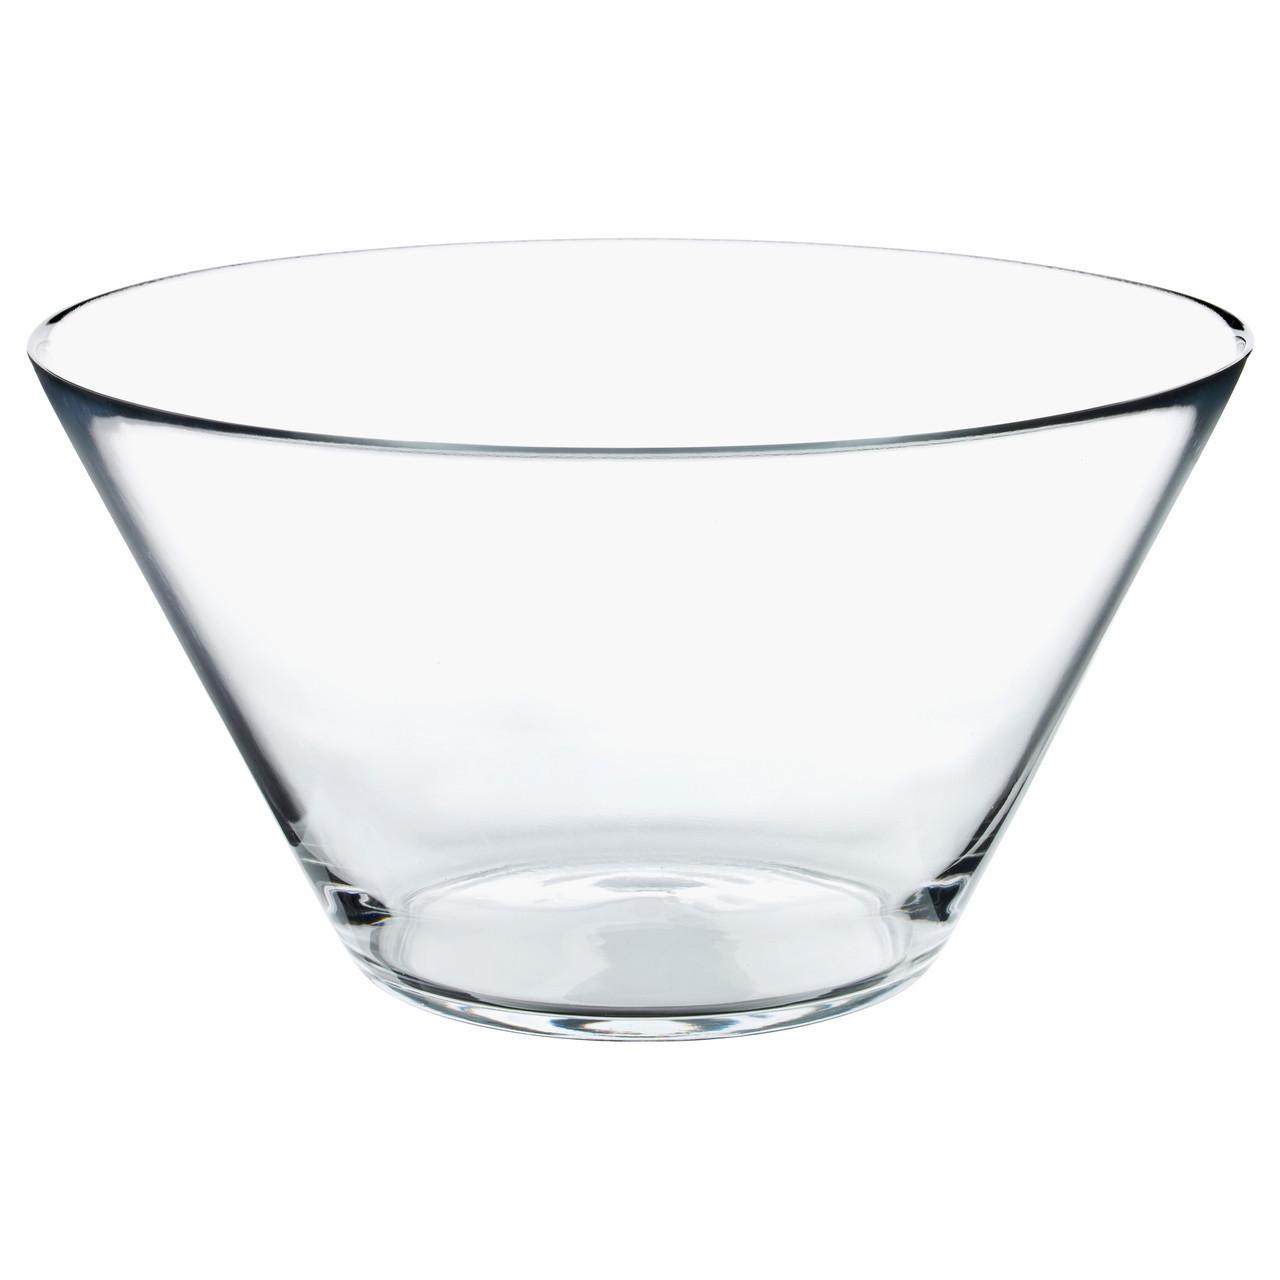 Миска икеа TRYGG, стекло, прозрачная, IKEA, 201.324.53